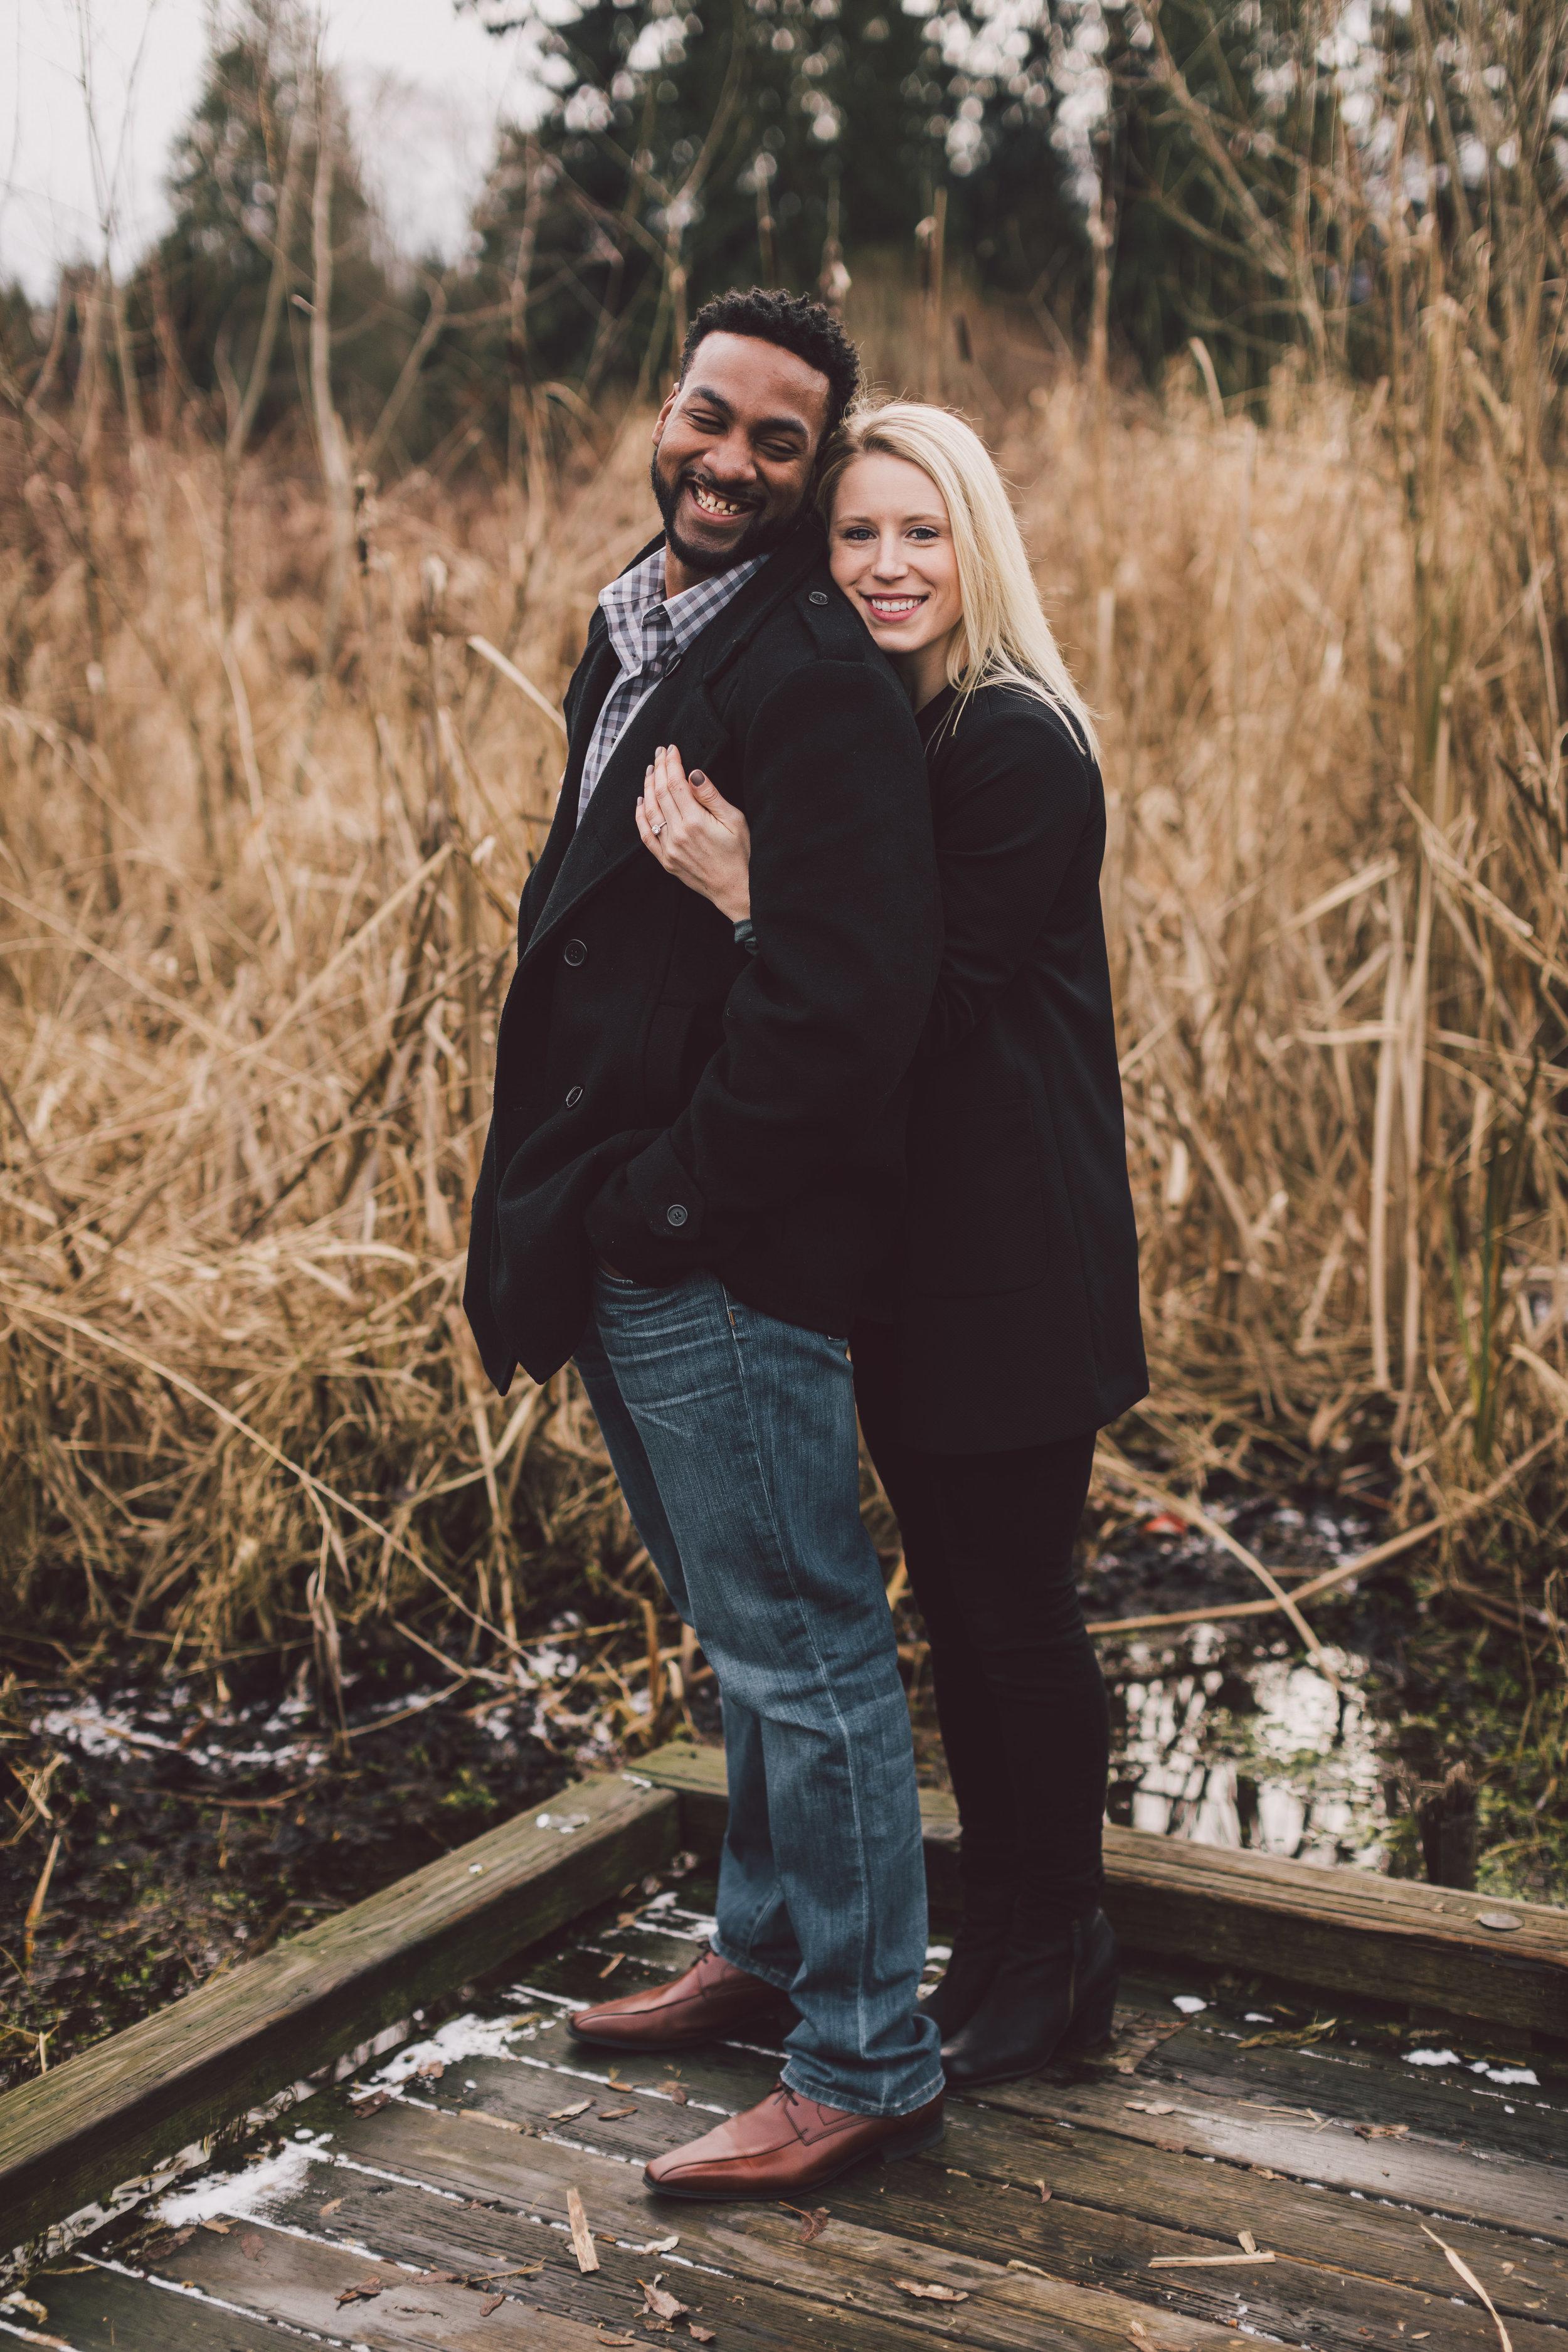 Wedding Planner Seattle | Wedding Wise | Luma Weddings | Seattle Engagement Photos